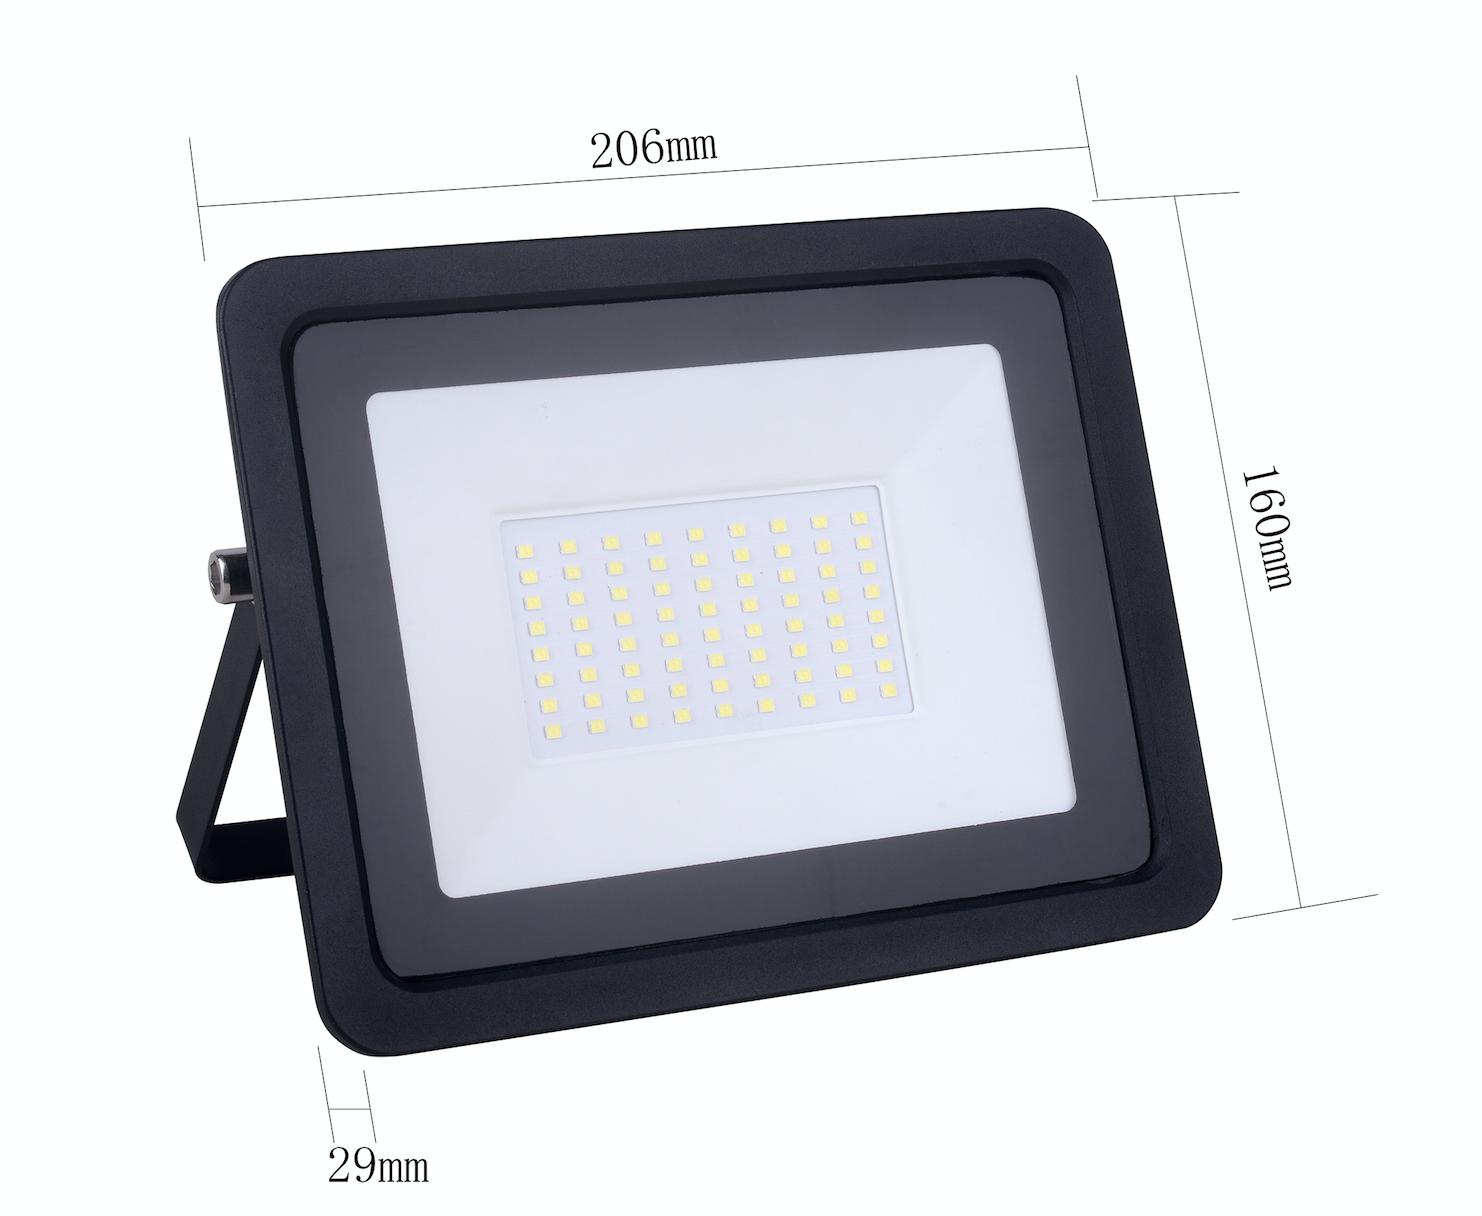 Kraftig svart LED LYSKASTER 70W. Fra Luxnor! Norgeslykten